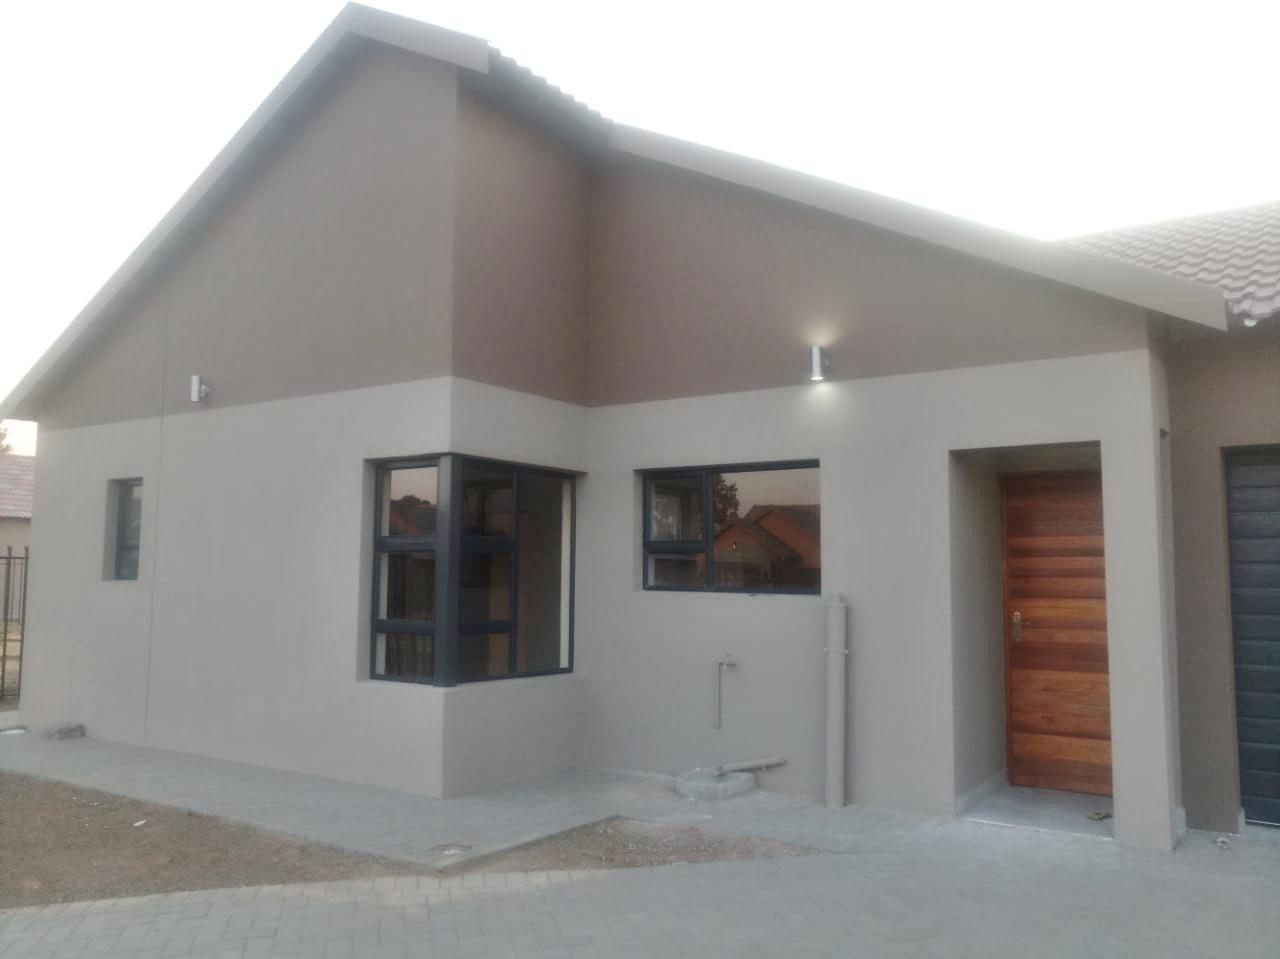 3 Bedroom House For Sale in Bloemspruit